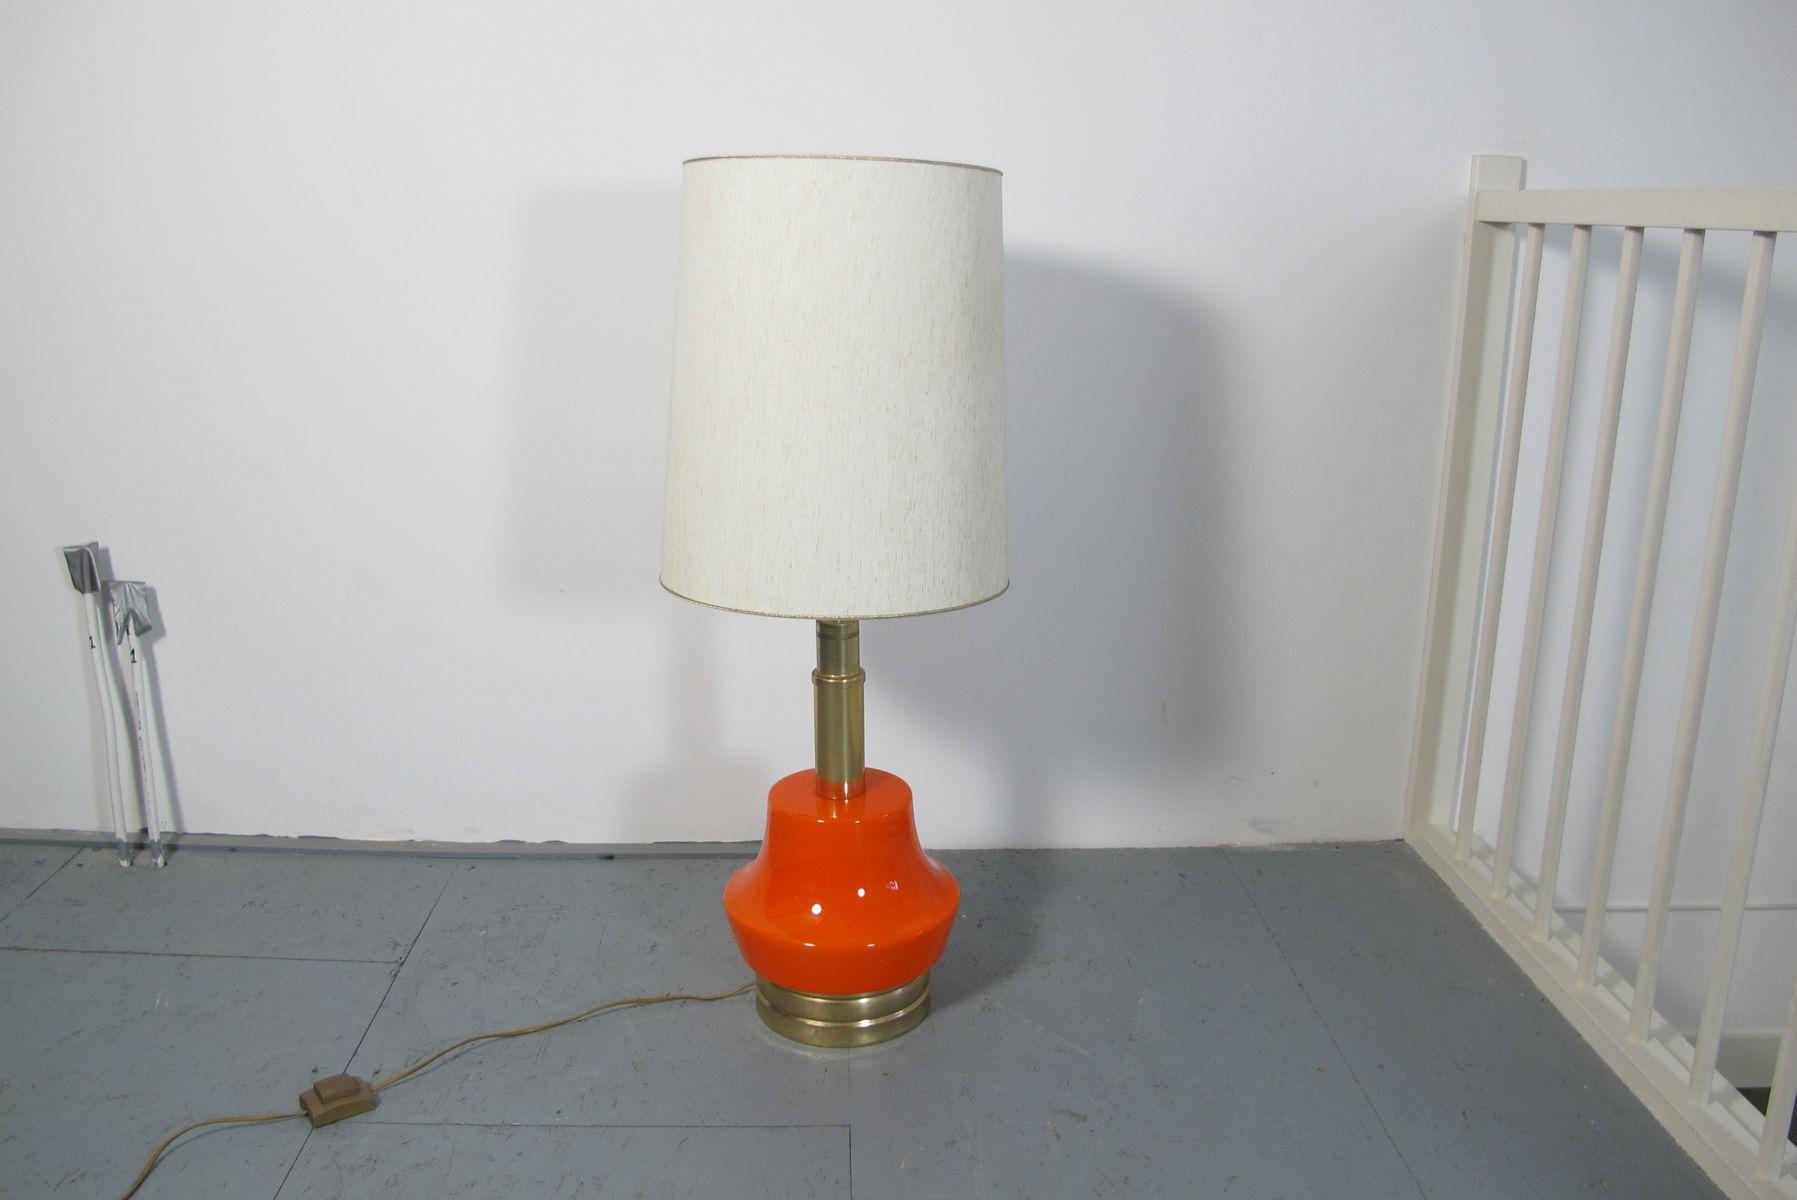 Vintage Stehlampe aus Italien